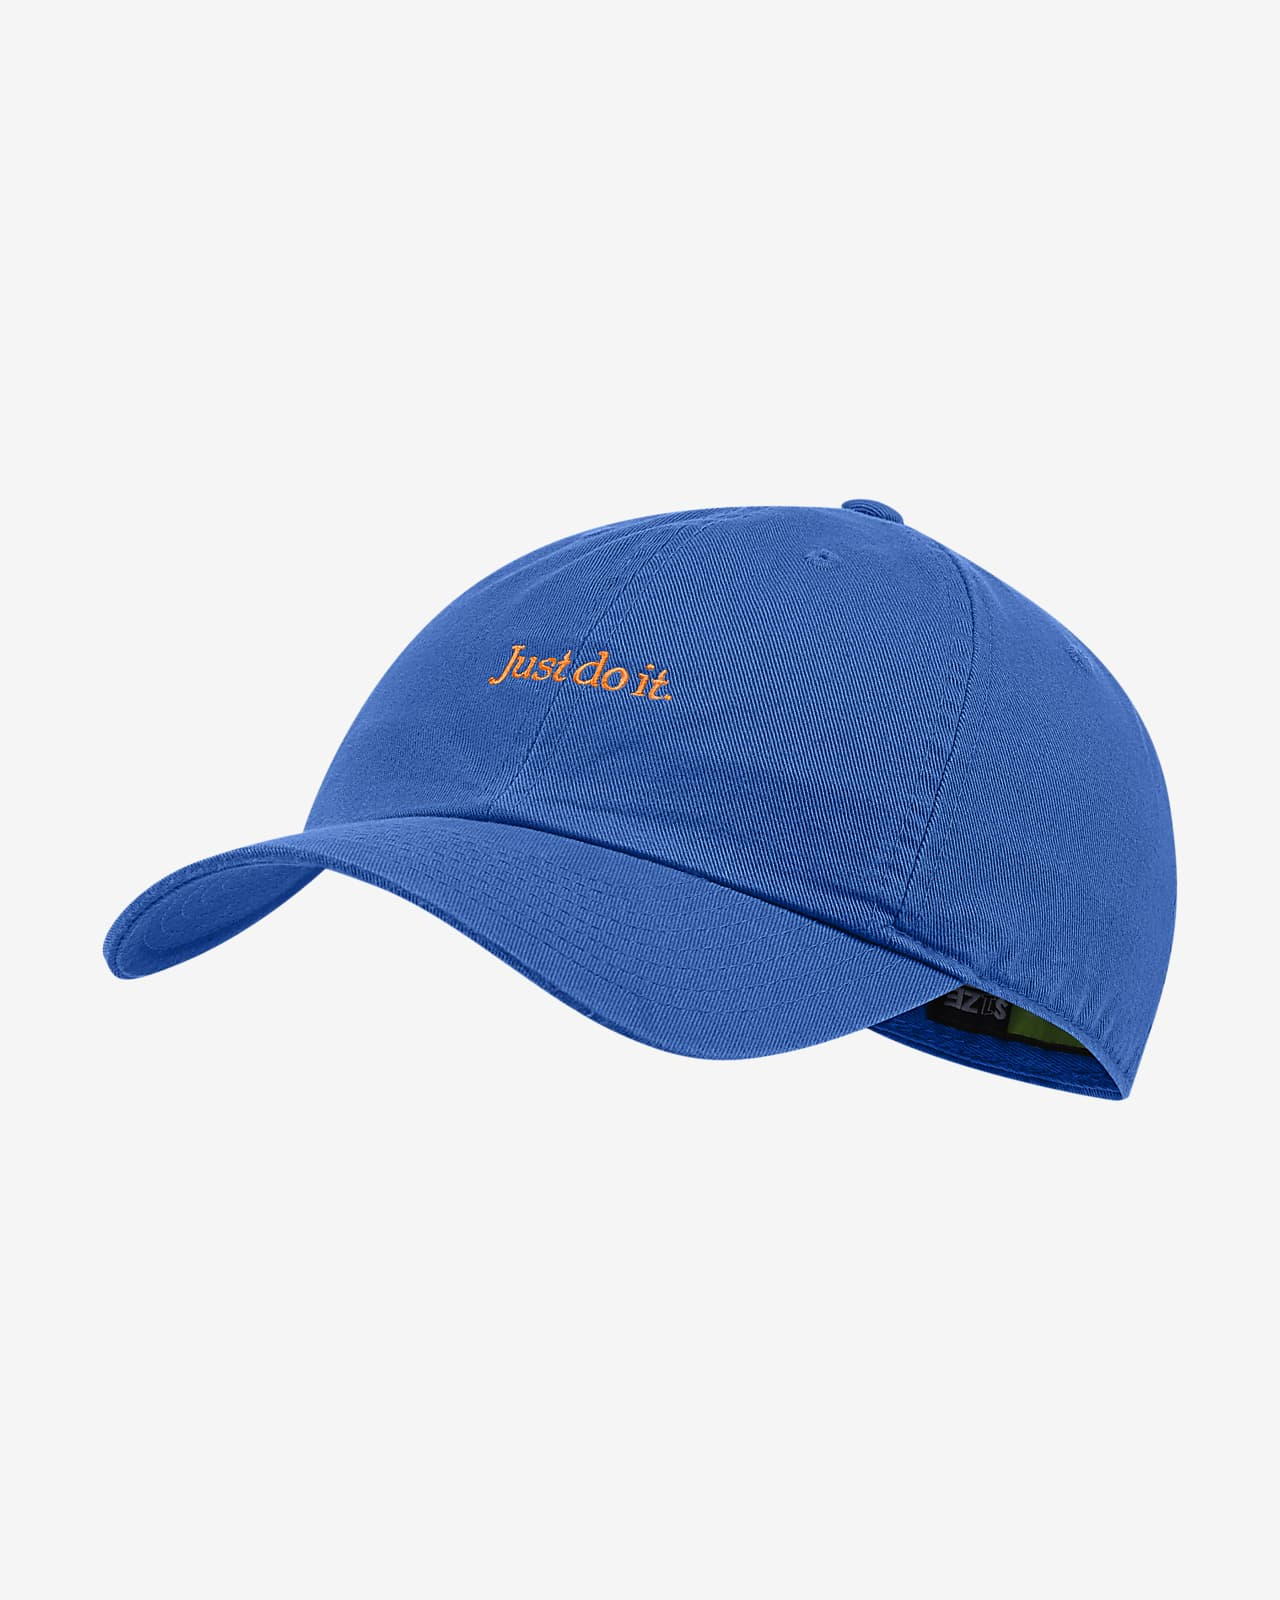 Nike Sportswear Heritage86 Adjustable Hat